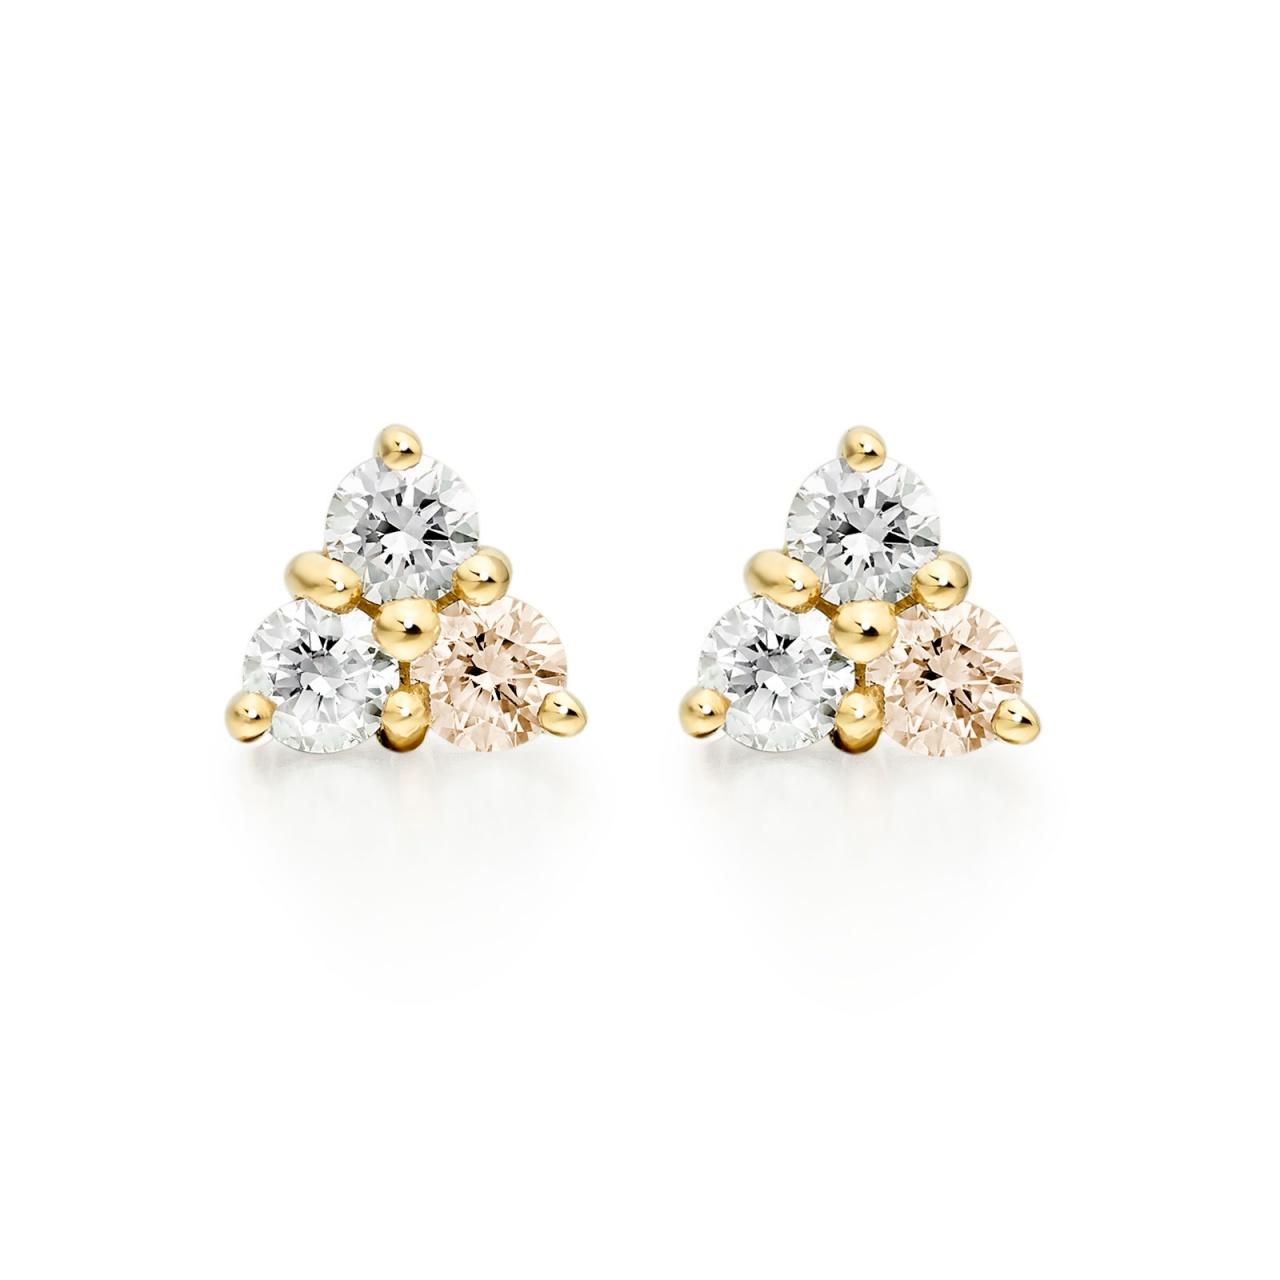 Astral Moon Earrings in Yellow Gold-EADIYG1100-1